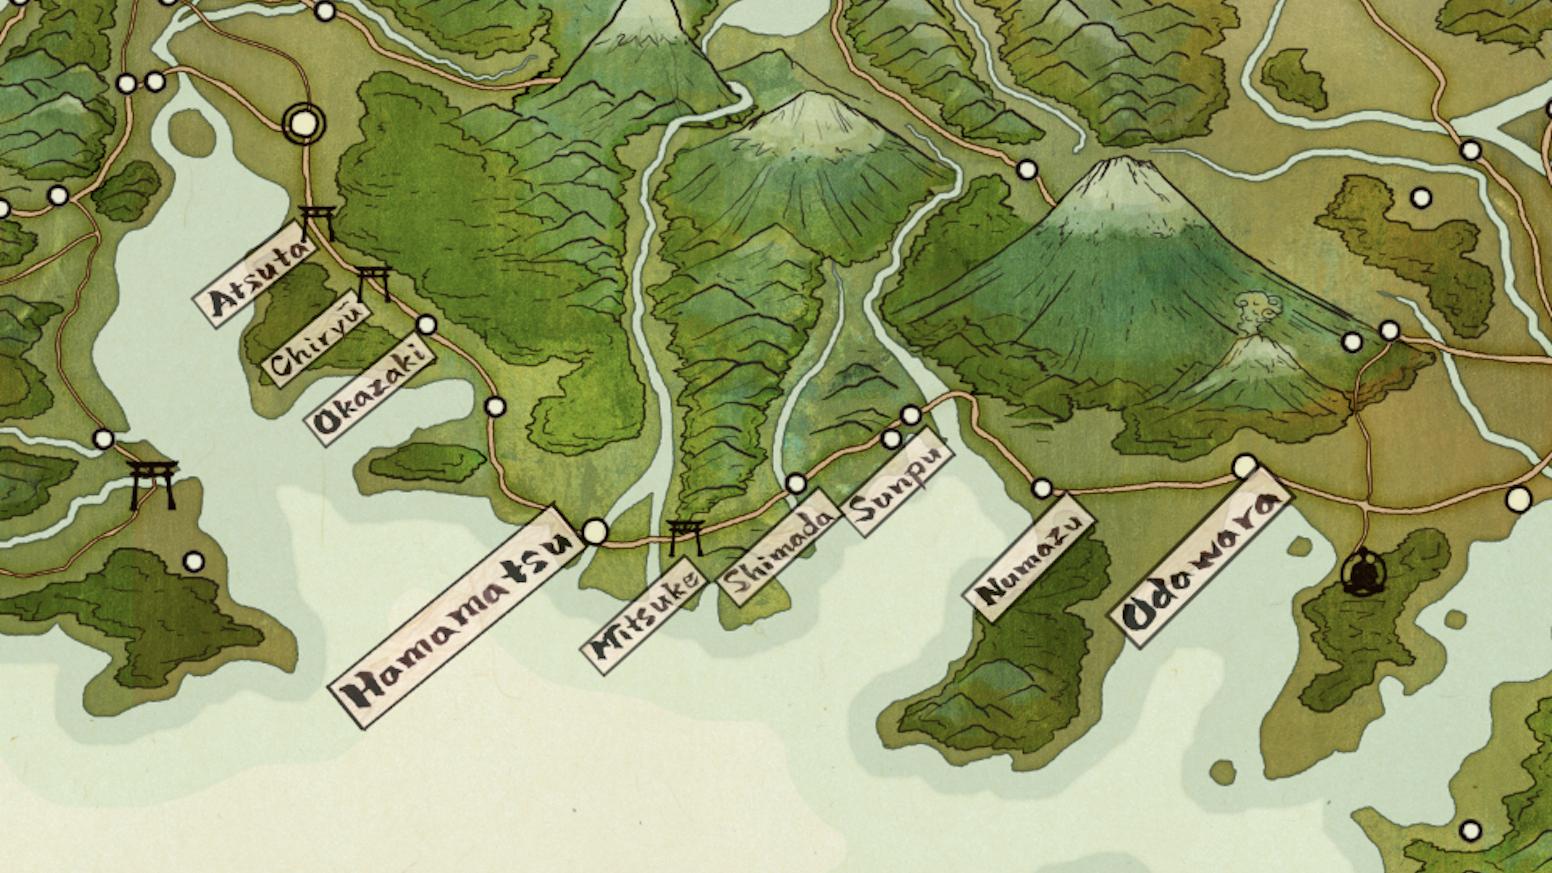 A Land Of Narrow Paths By Nicholas Cladis Kickstarter